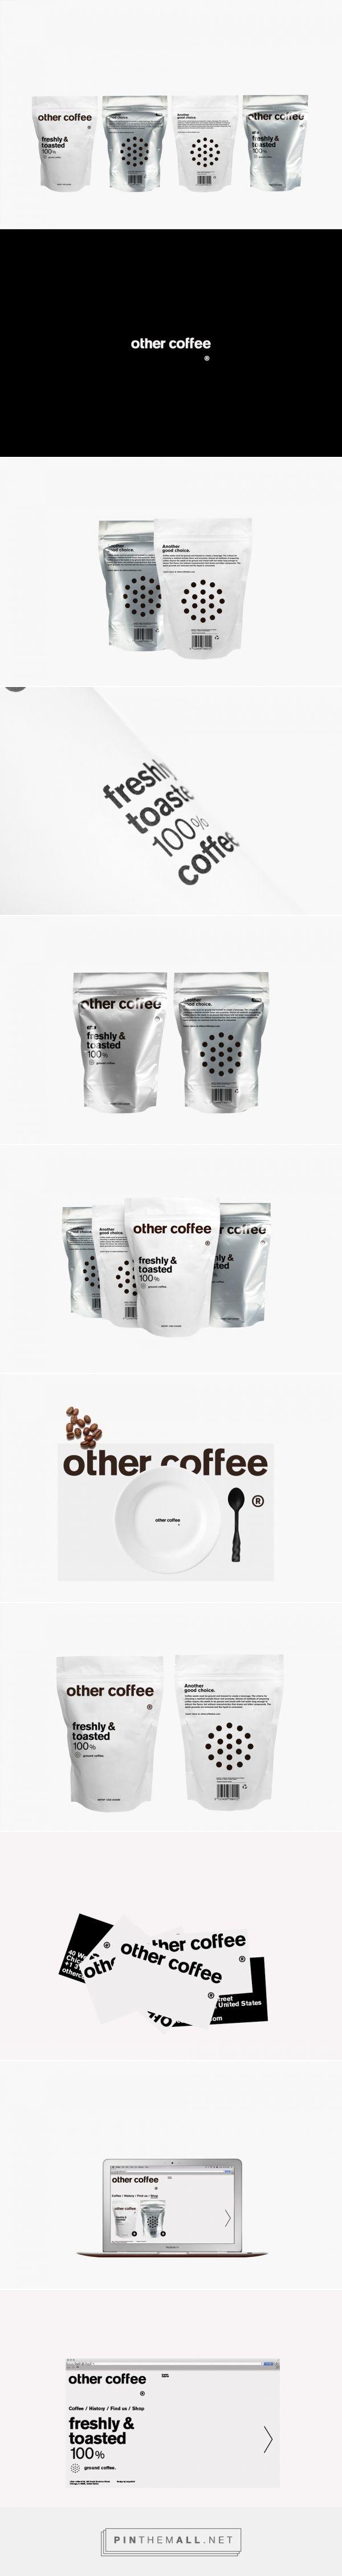 other coffee - Empatía